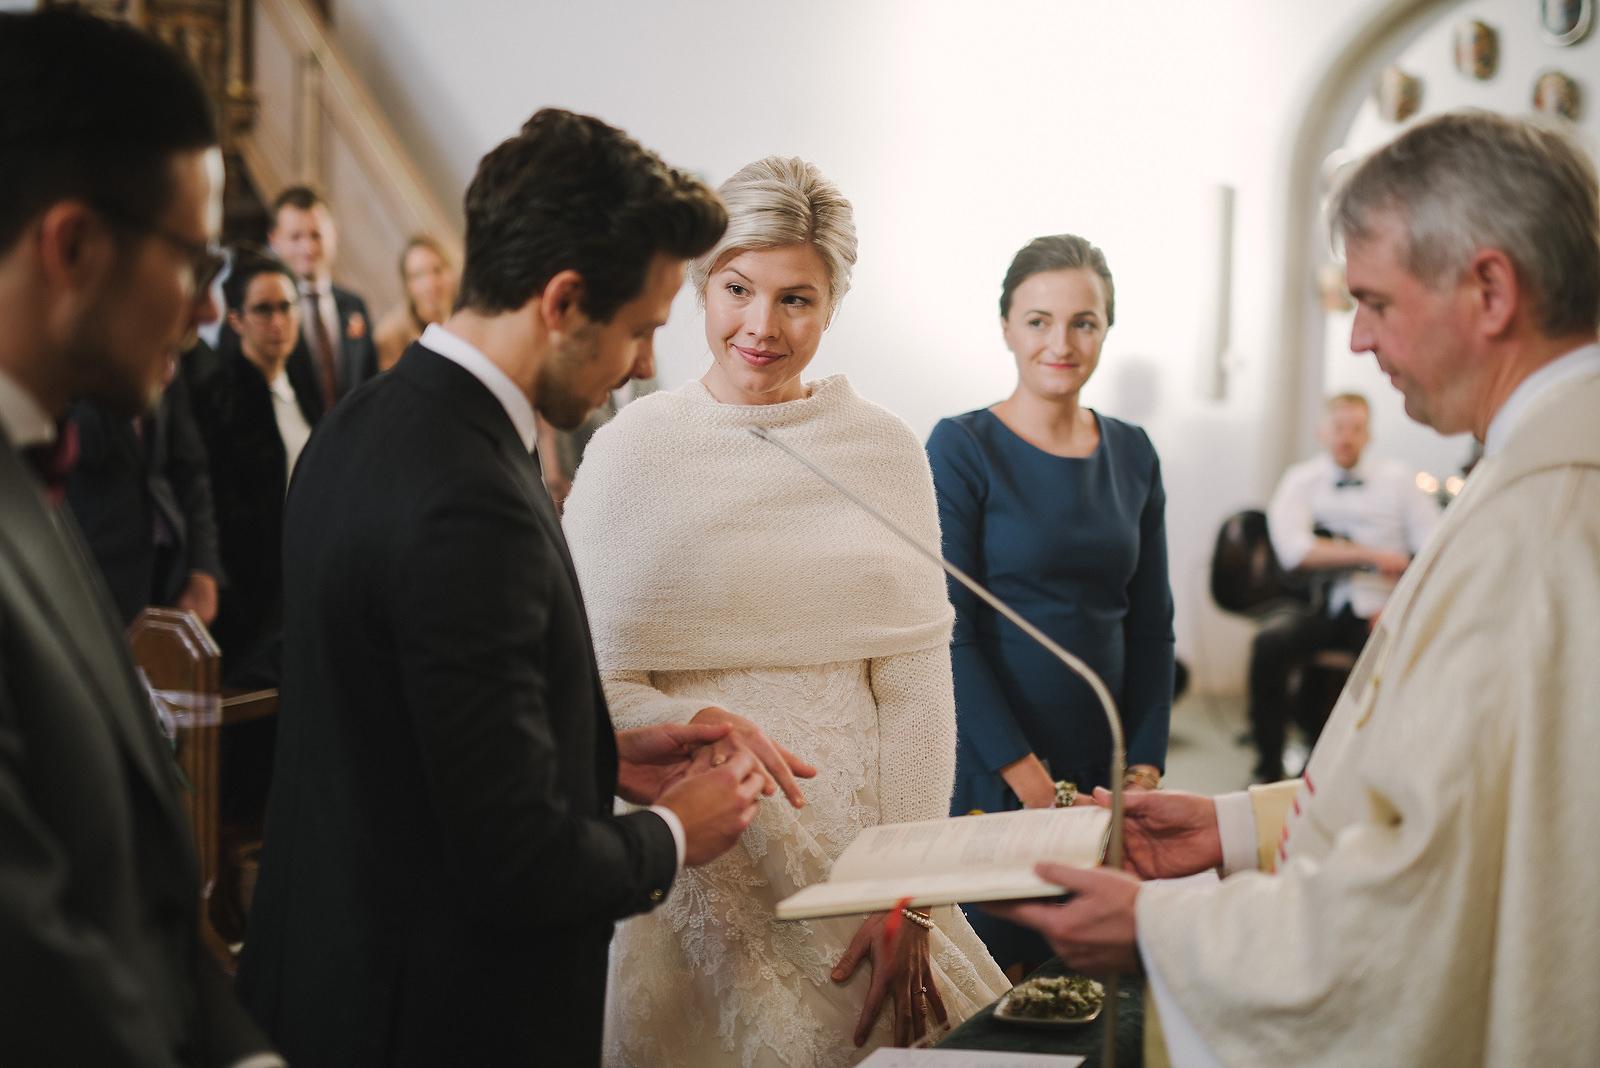 Fotograf Konstanz - Silvester Wedding in Hagnau / Friedrichshafen at Lake of Constance  - 16 -